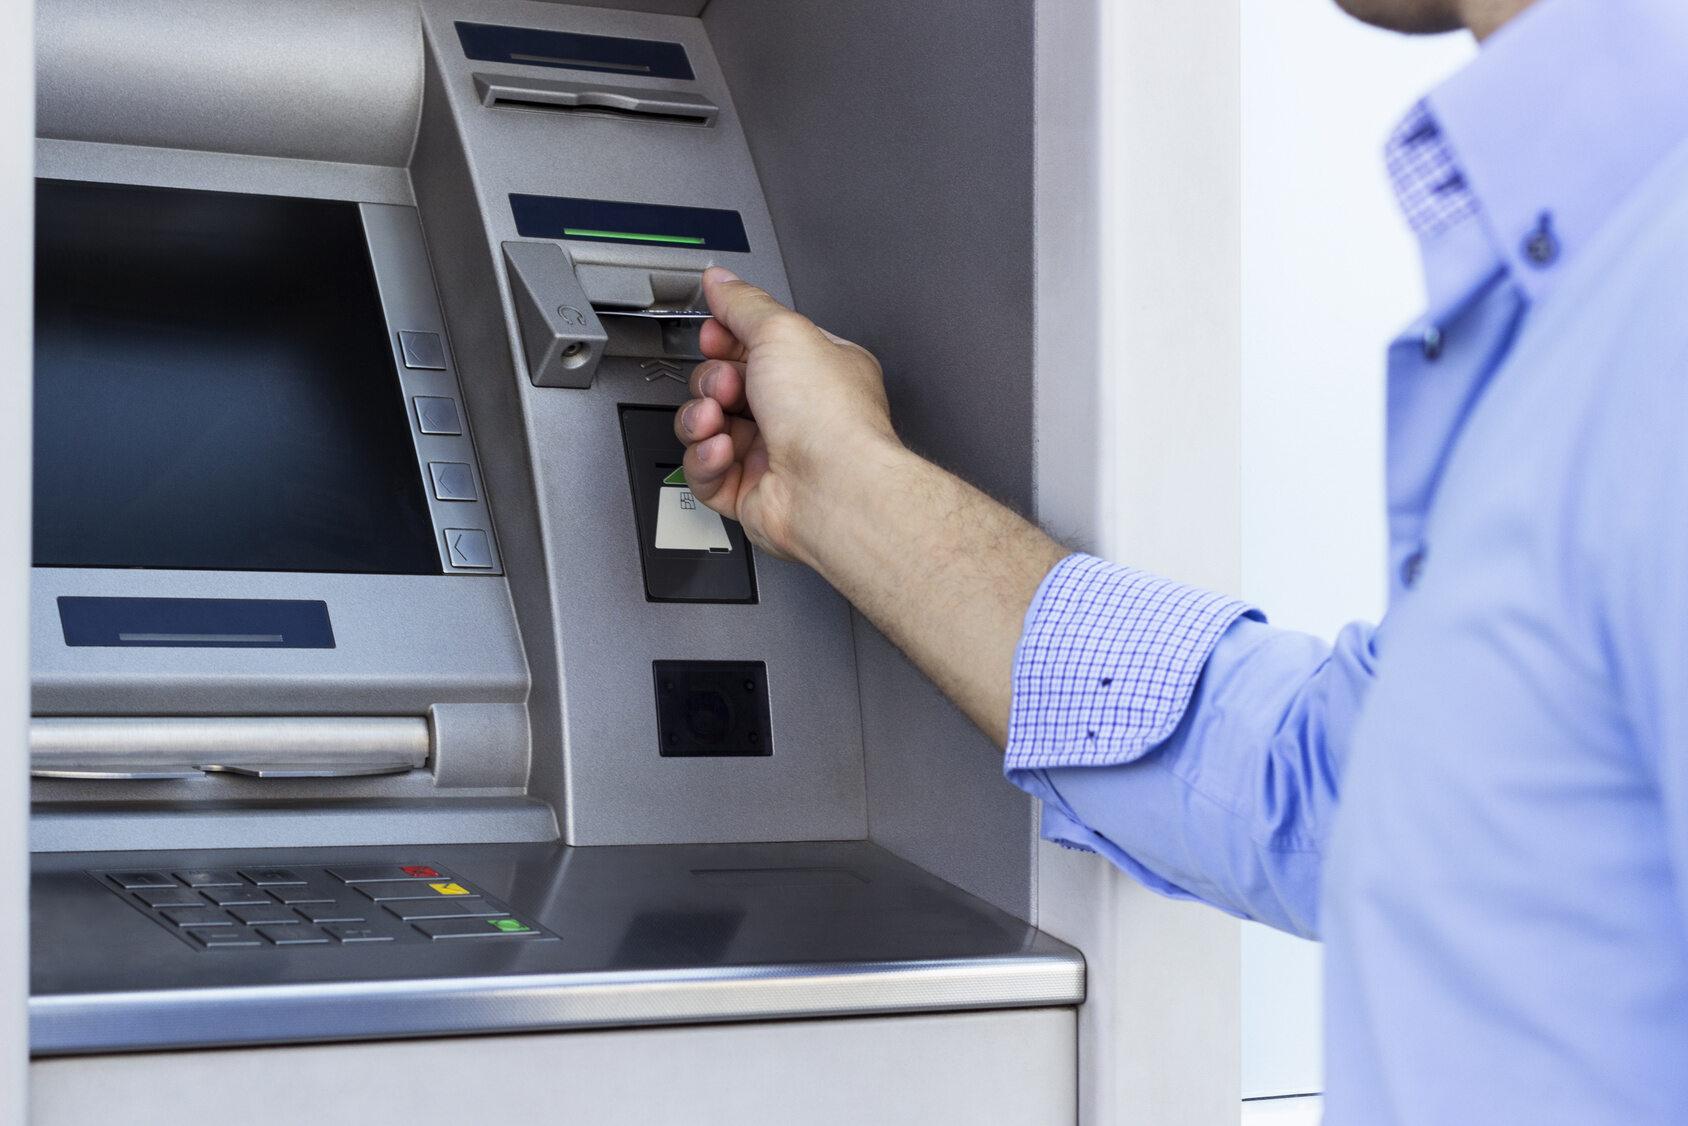 Bankomat (zdj. ilustracyjne)